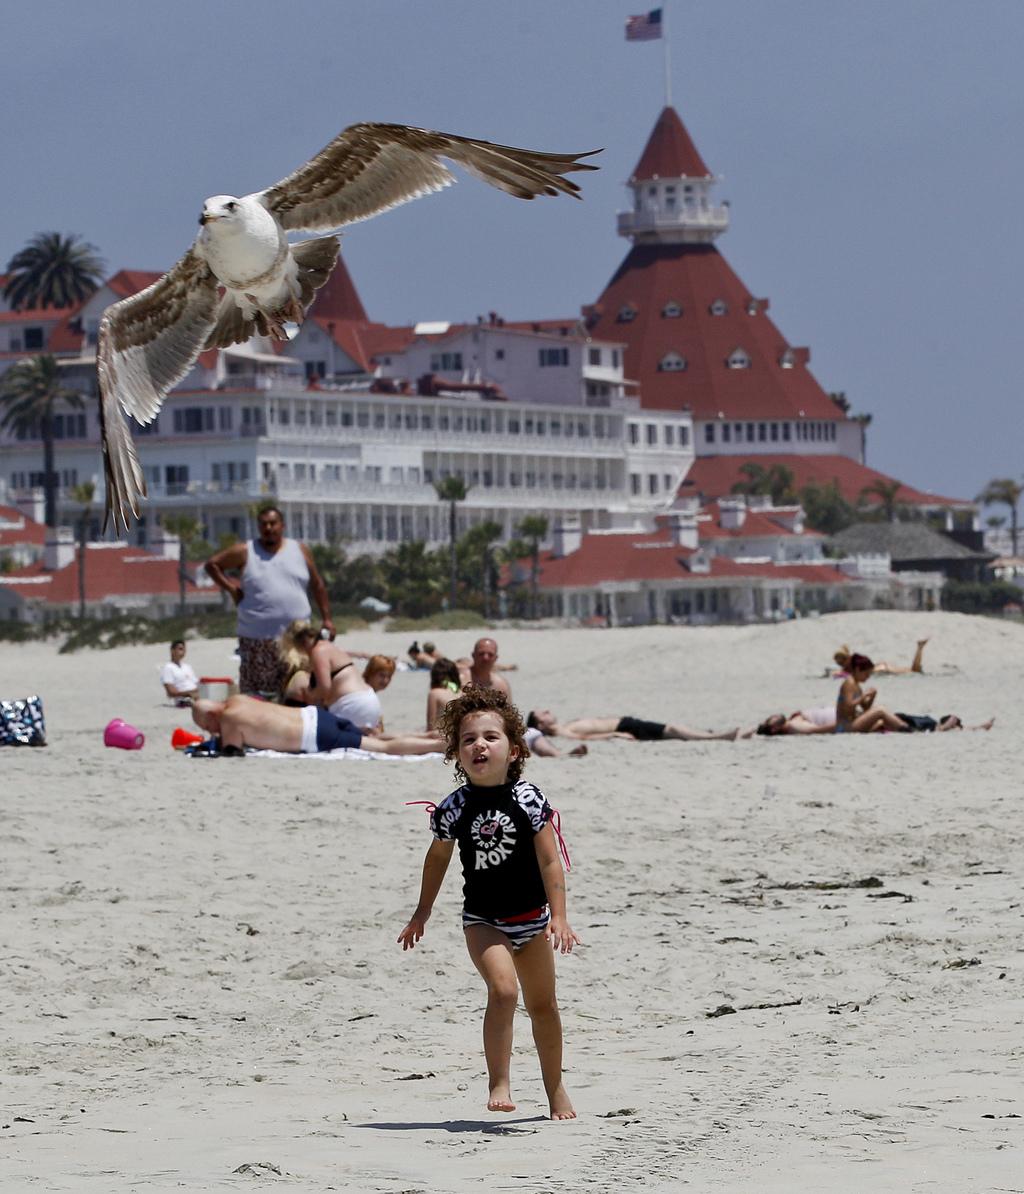 FILE - In this May 22, 2012, file photo, a child chases a sea gull on Coronado Beach in Coronado, Calif. Coronado Beach is No. 9 on the...